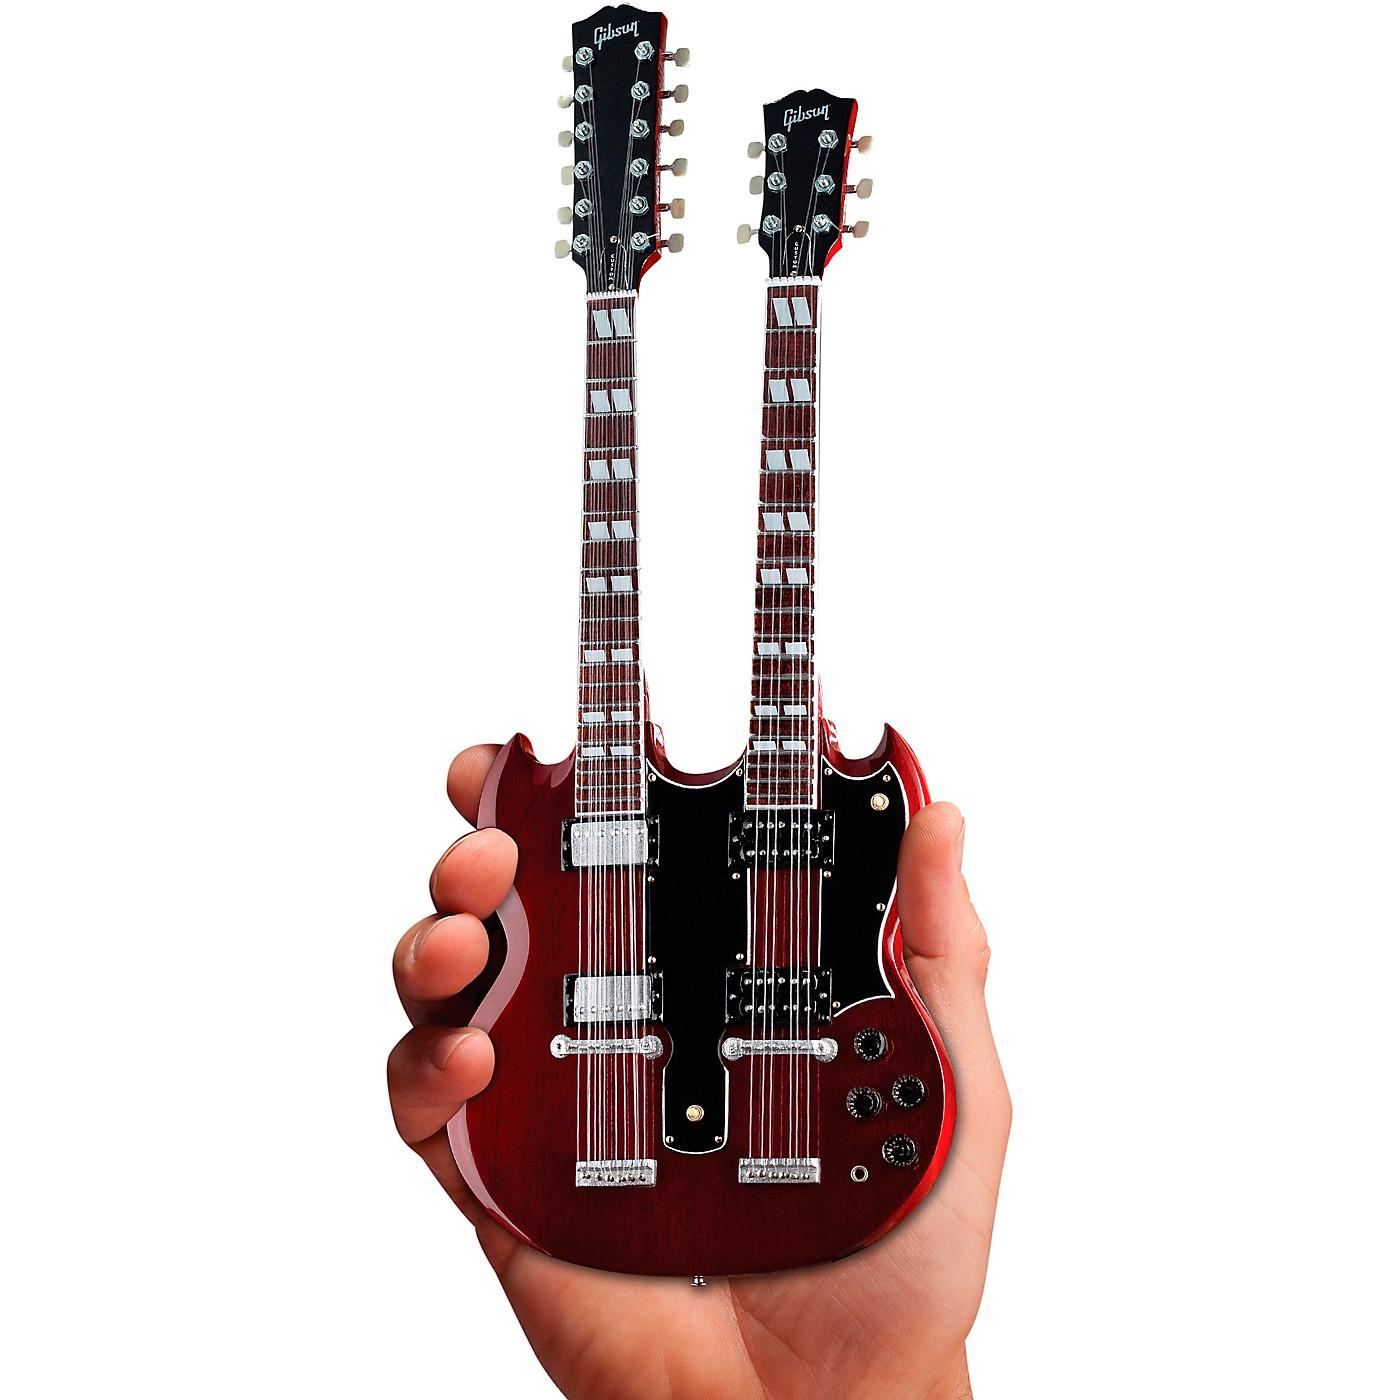 Axe Heaven Gibson SG EDS-1275 Doubleneck Cherry Officially Licensed Miniature Guitar Replica thumbnail